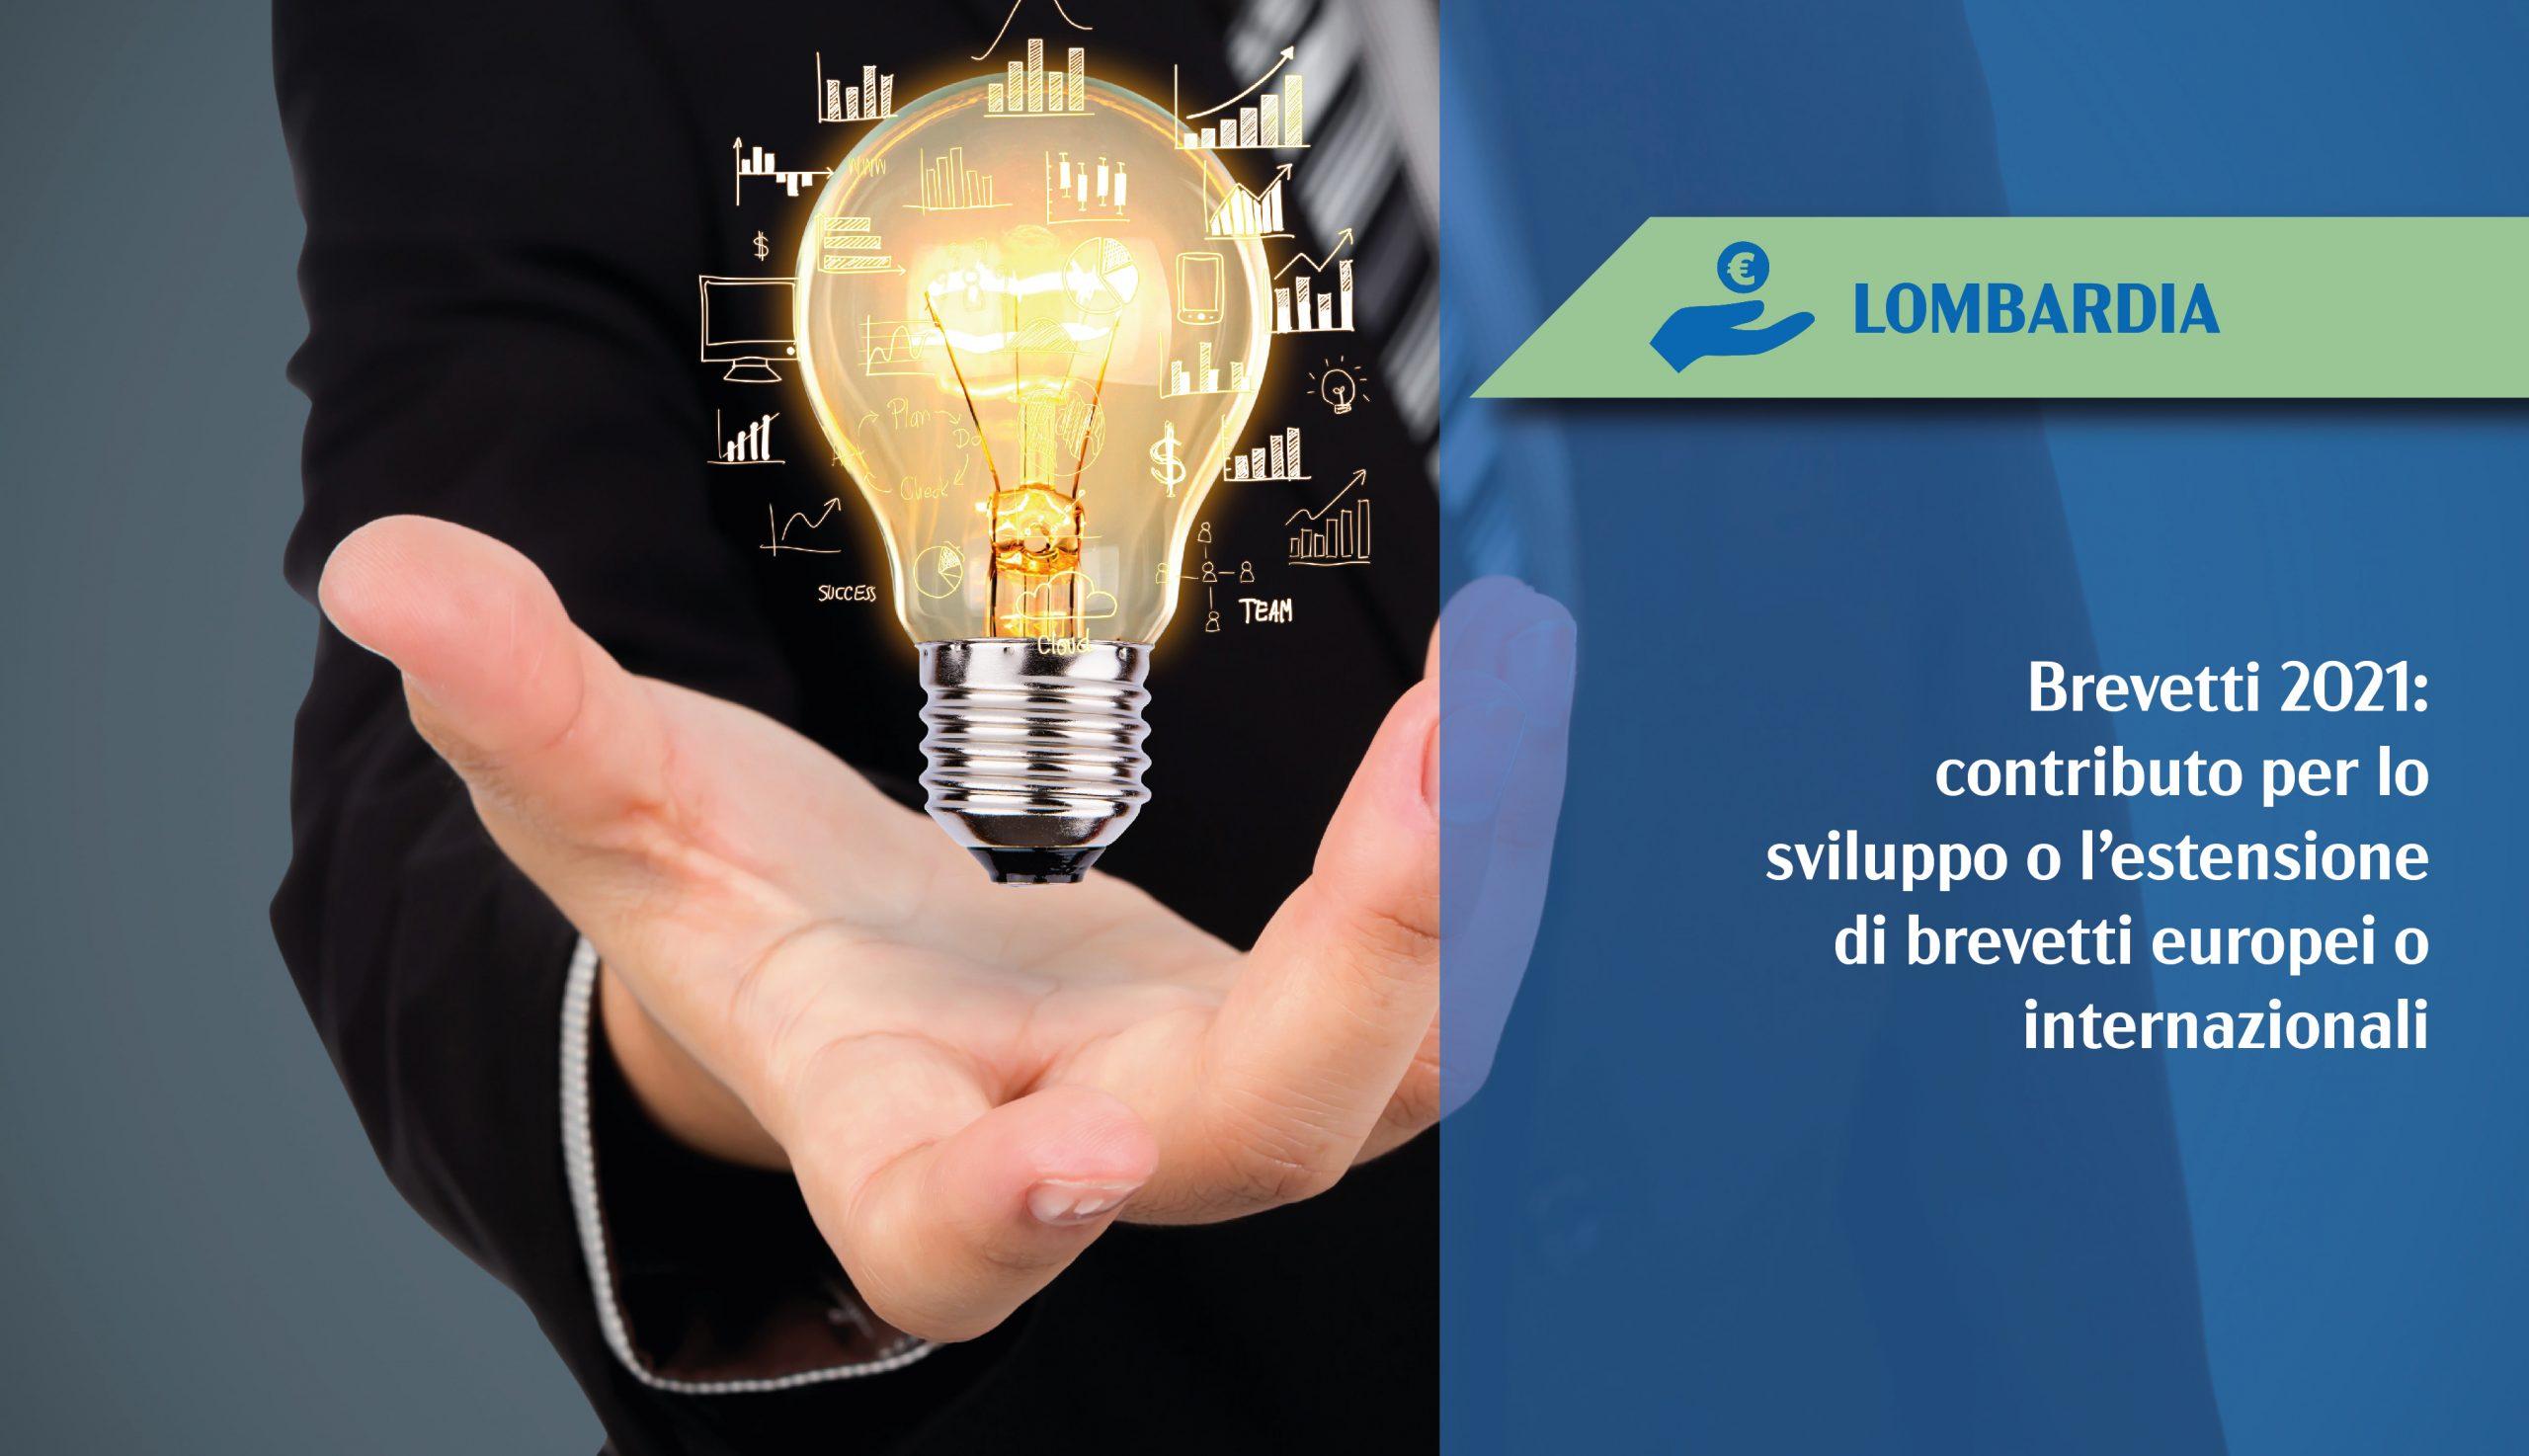 Lombardia Brevetti